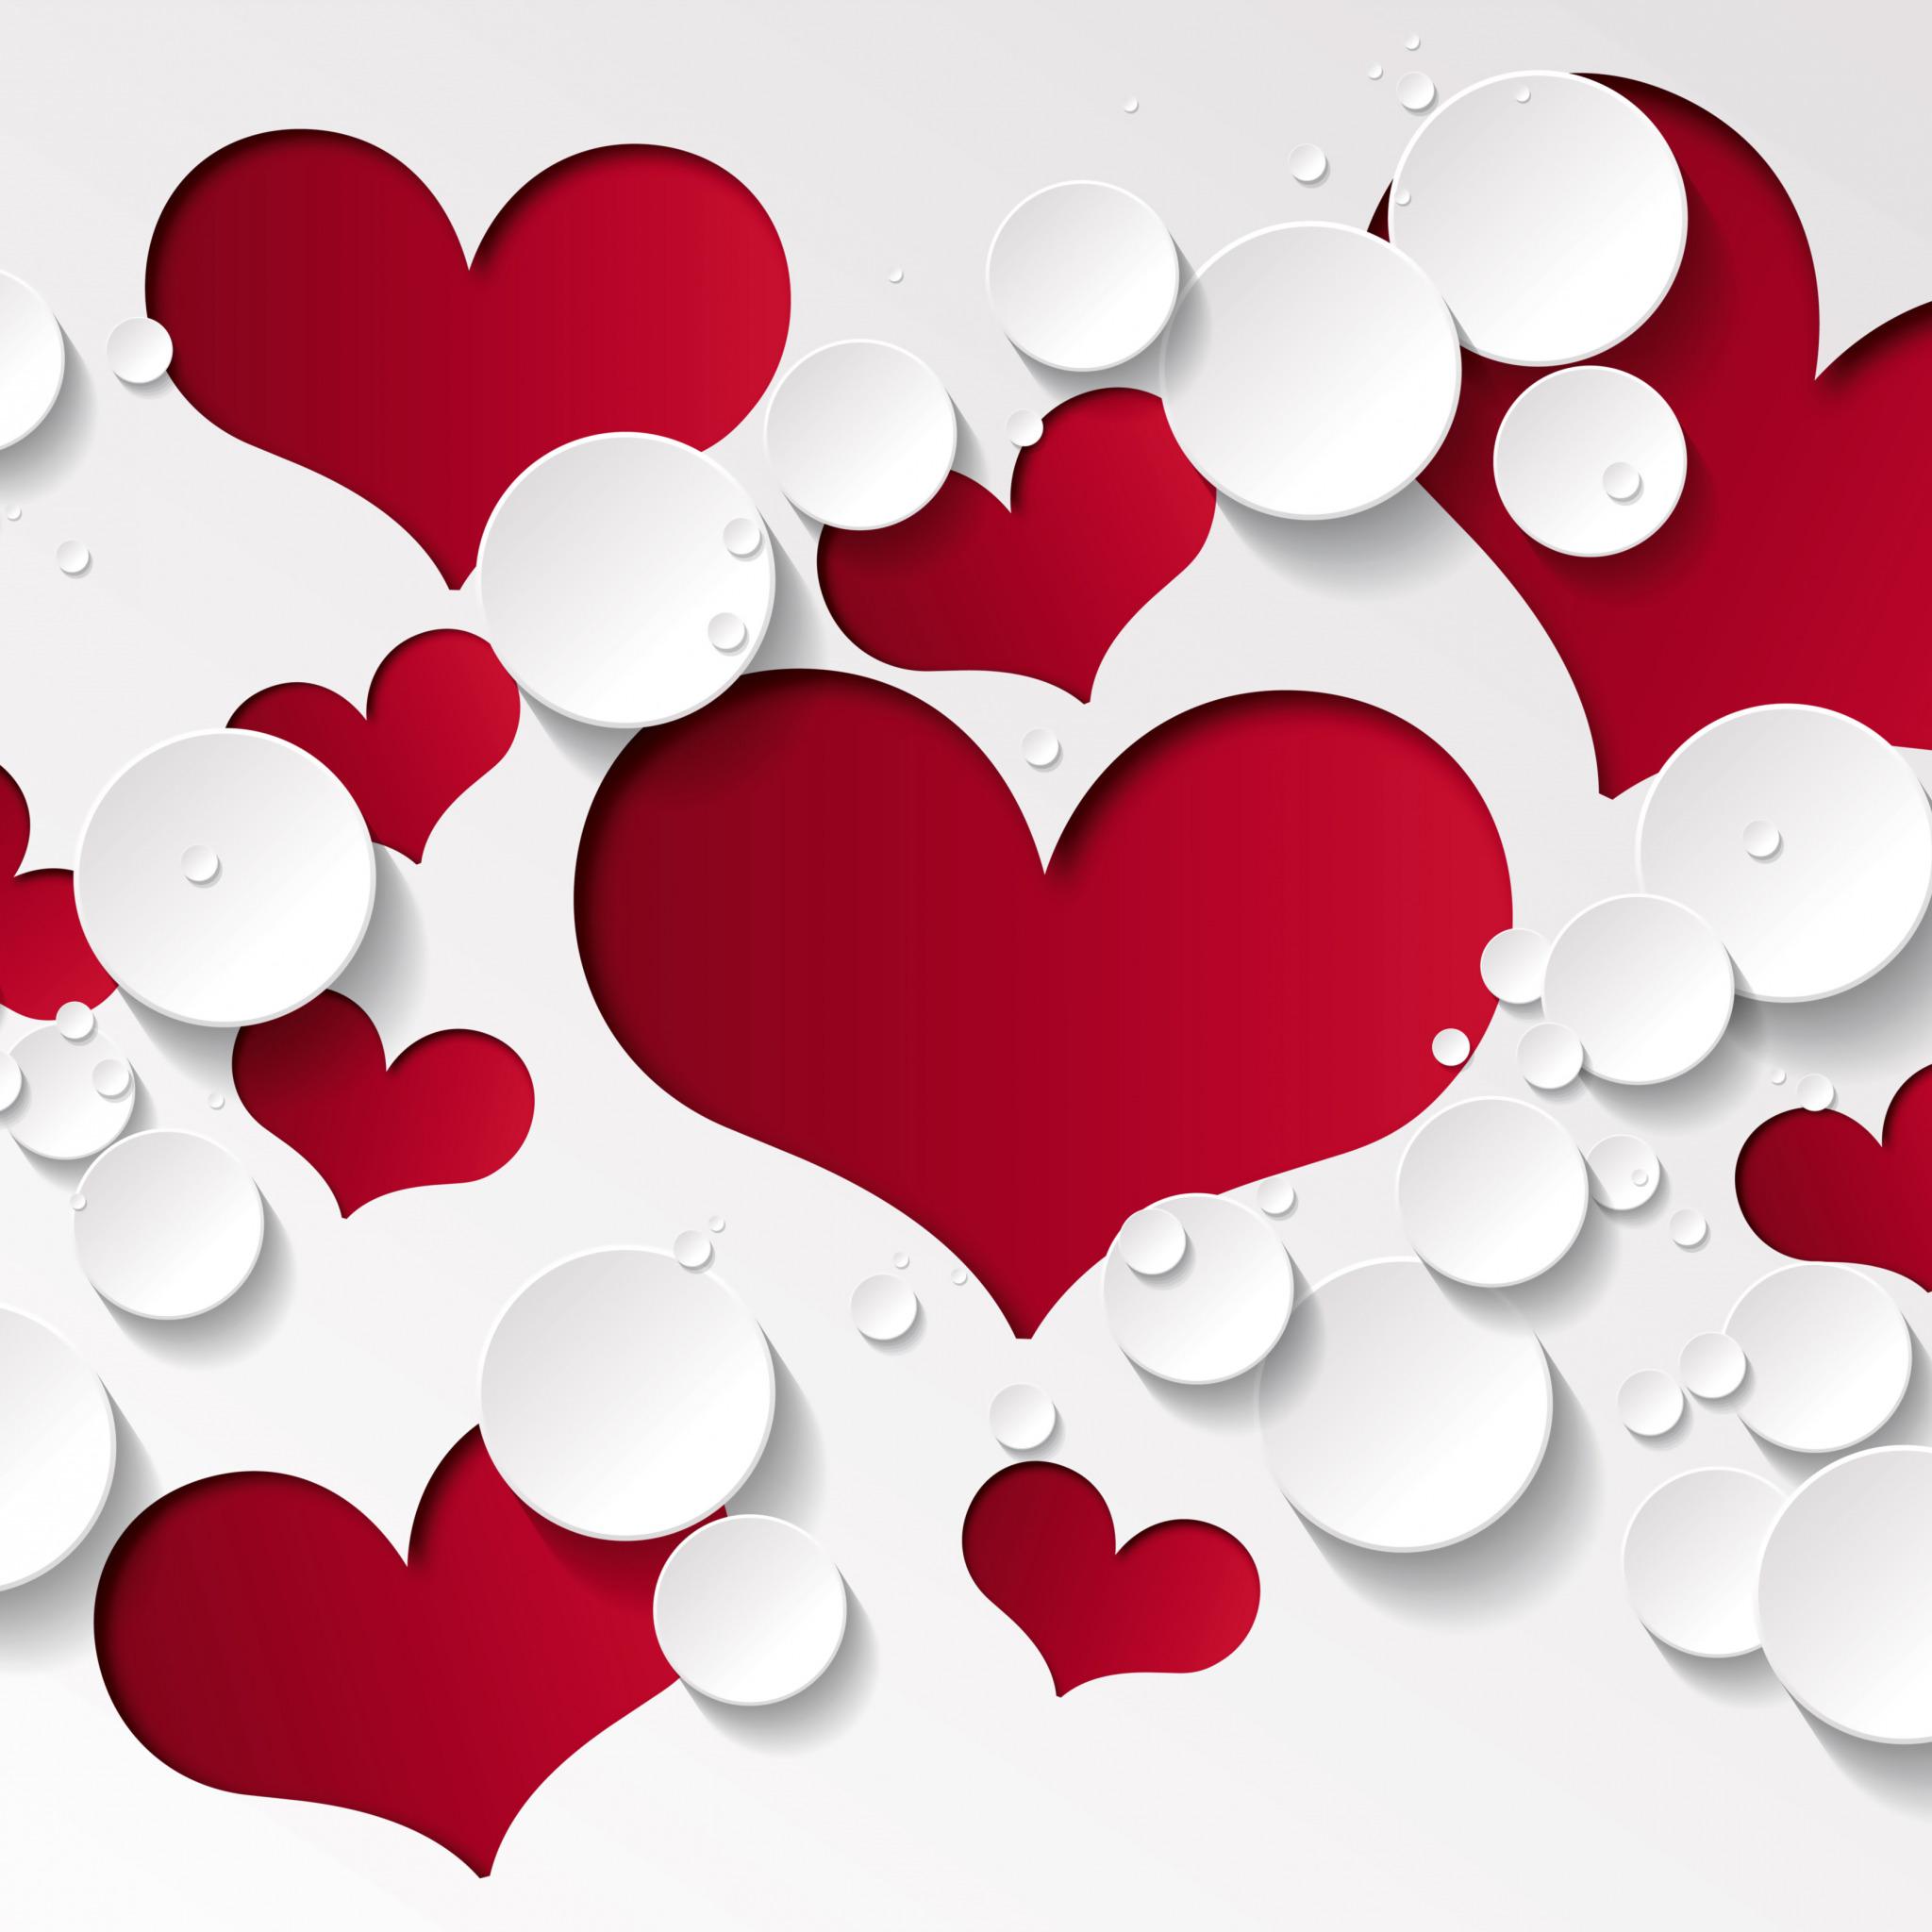 Картинки с сердцами в телефоне